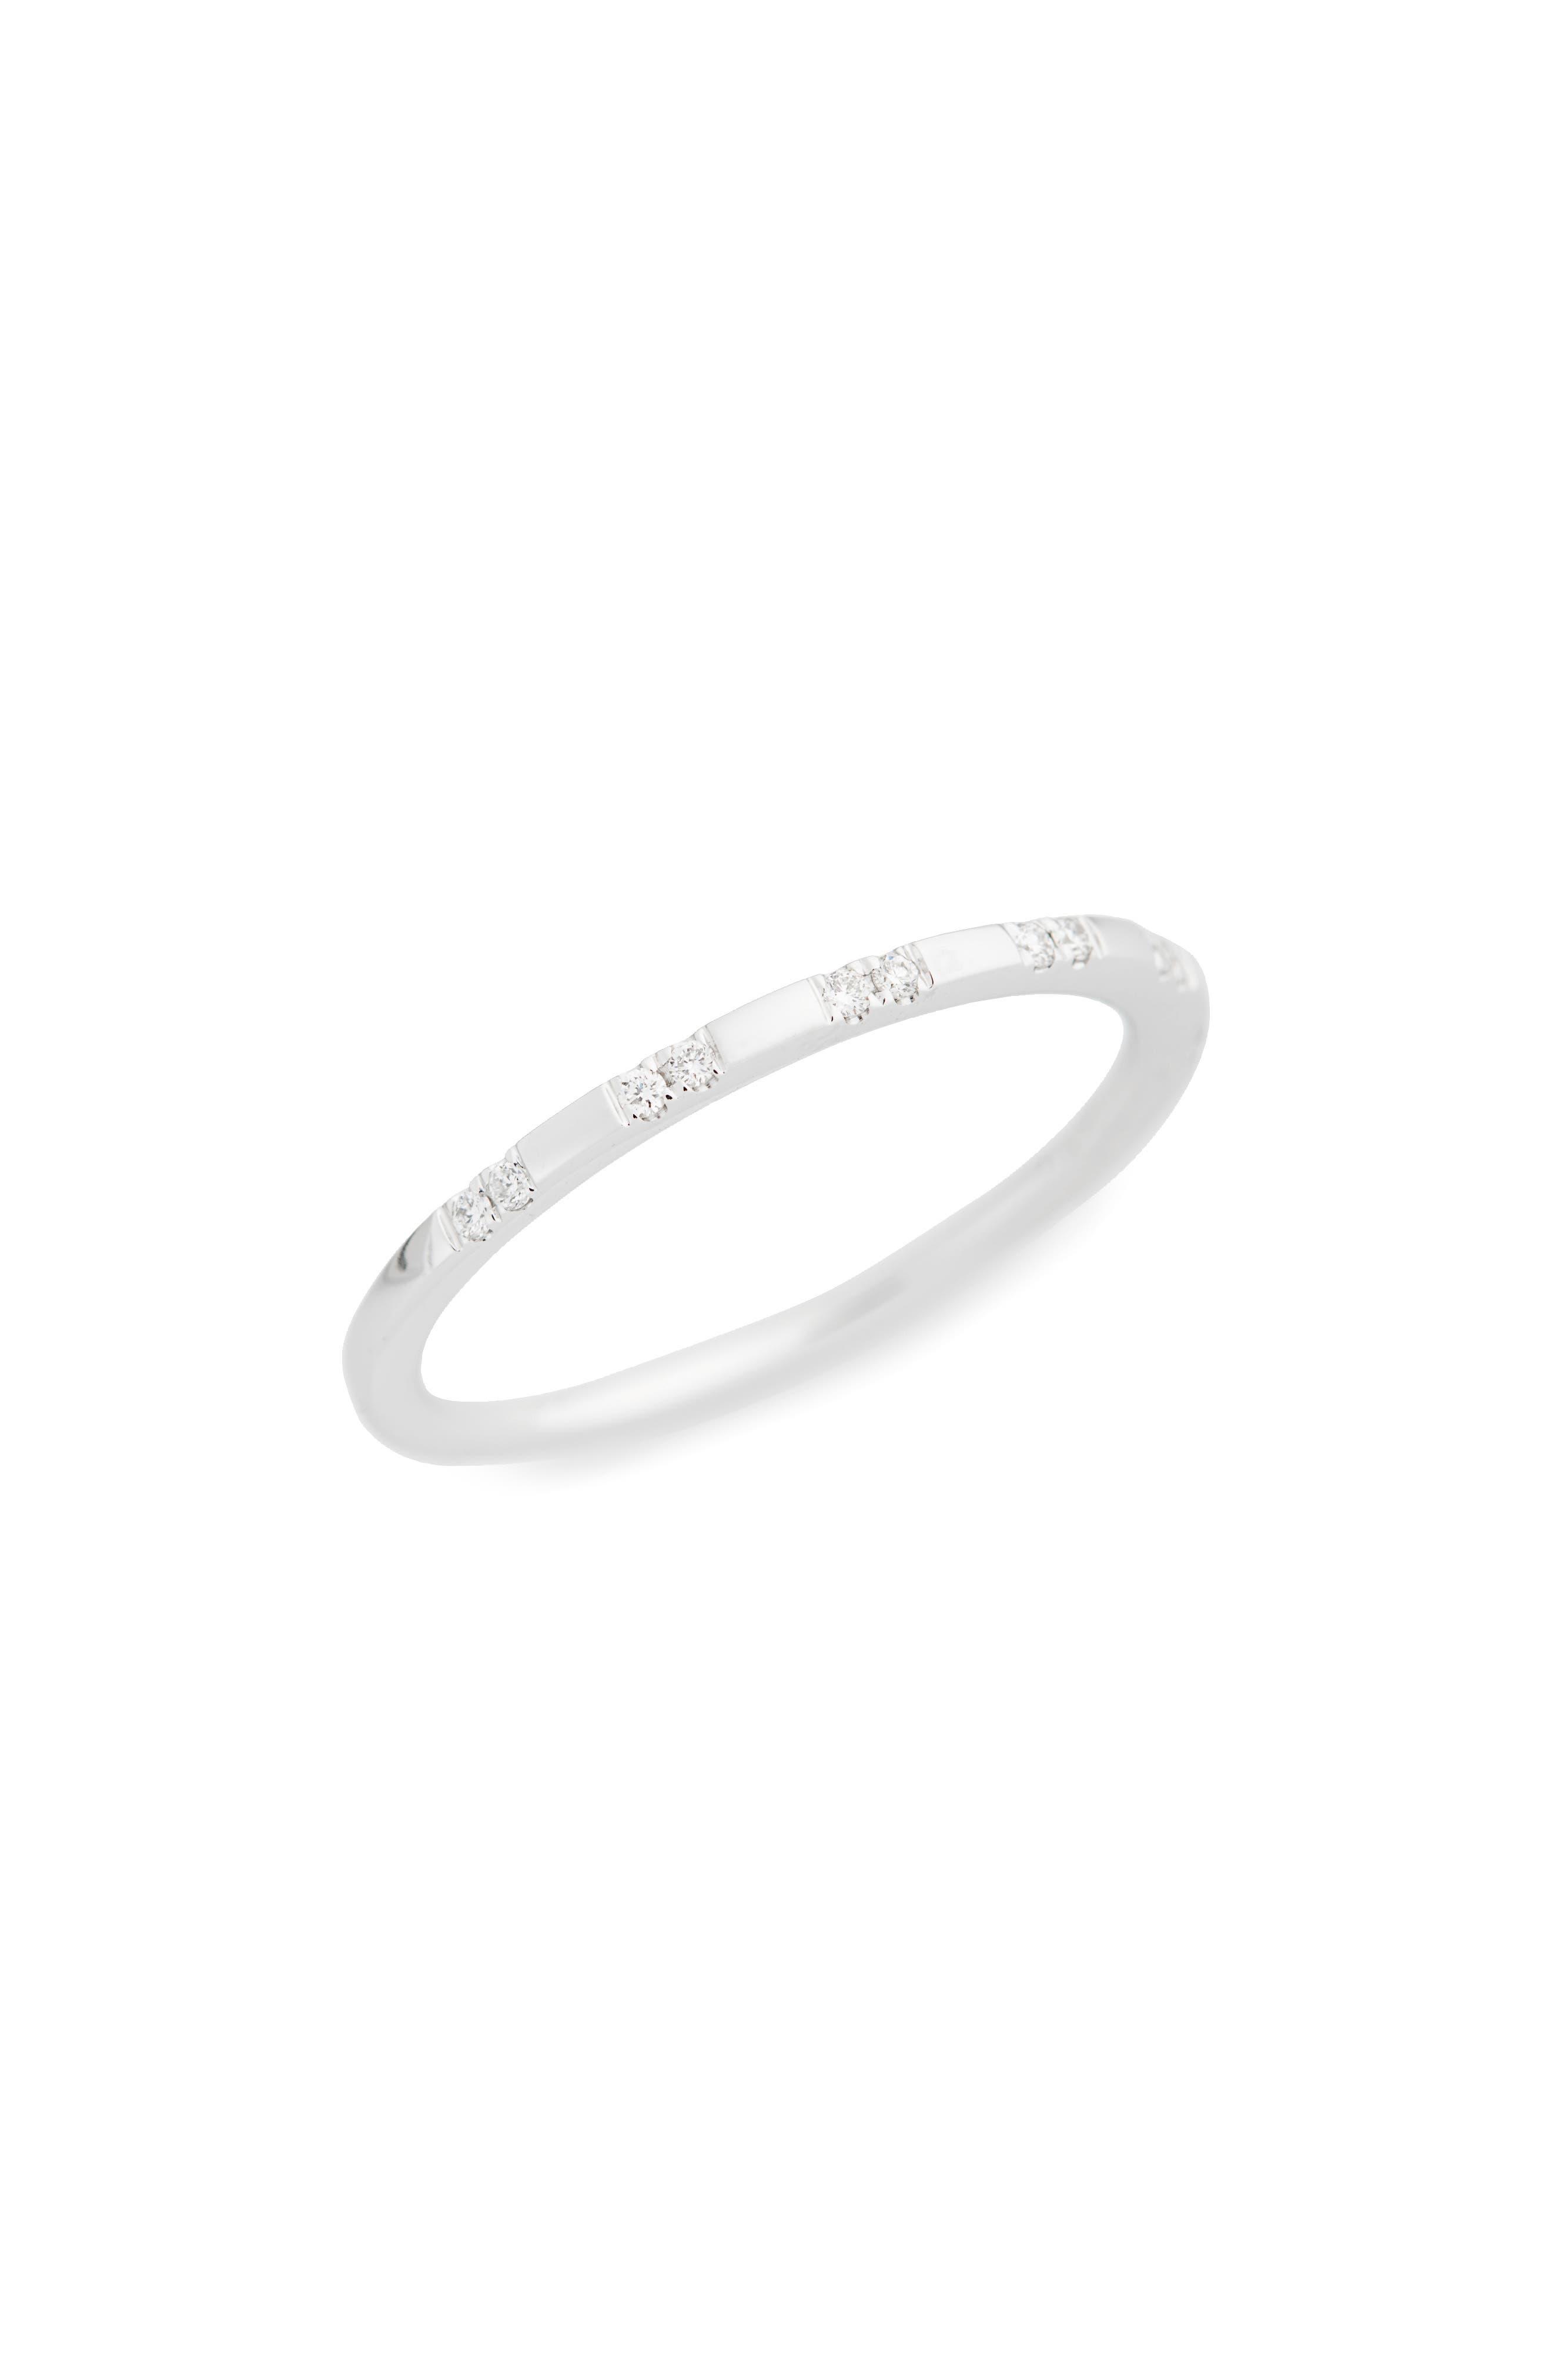 Prism Medium Stackable Diamond Ring,                             Main thumbnail 1, color,                             WHITE GOLD